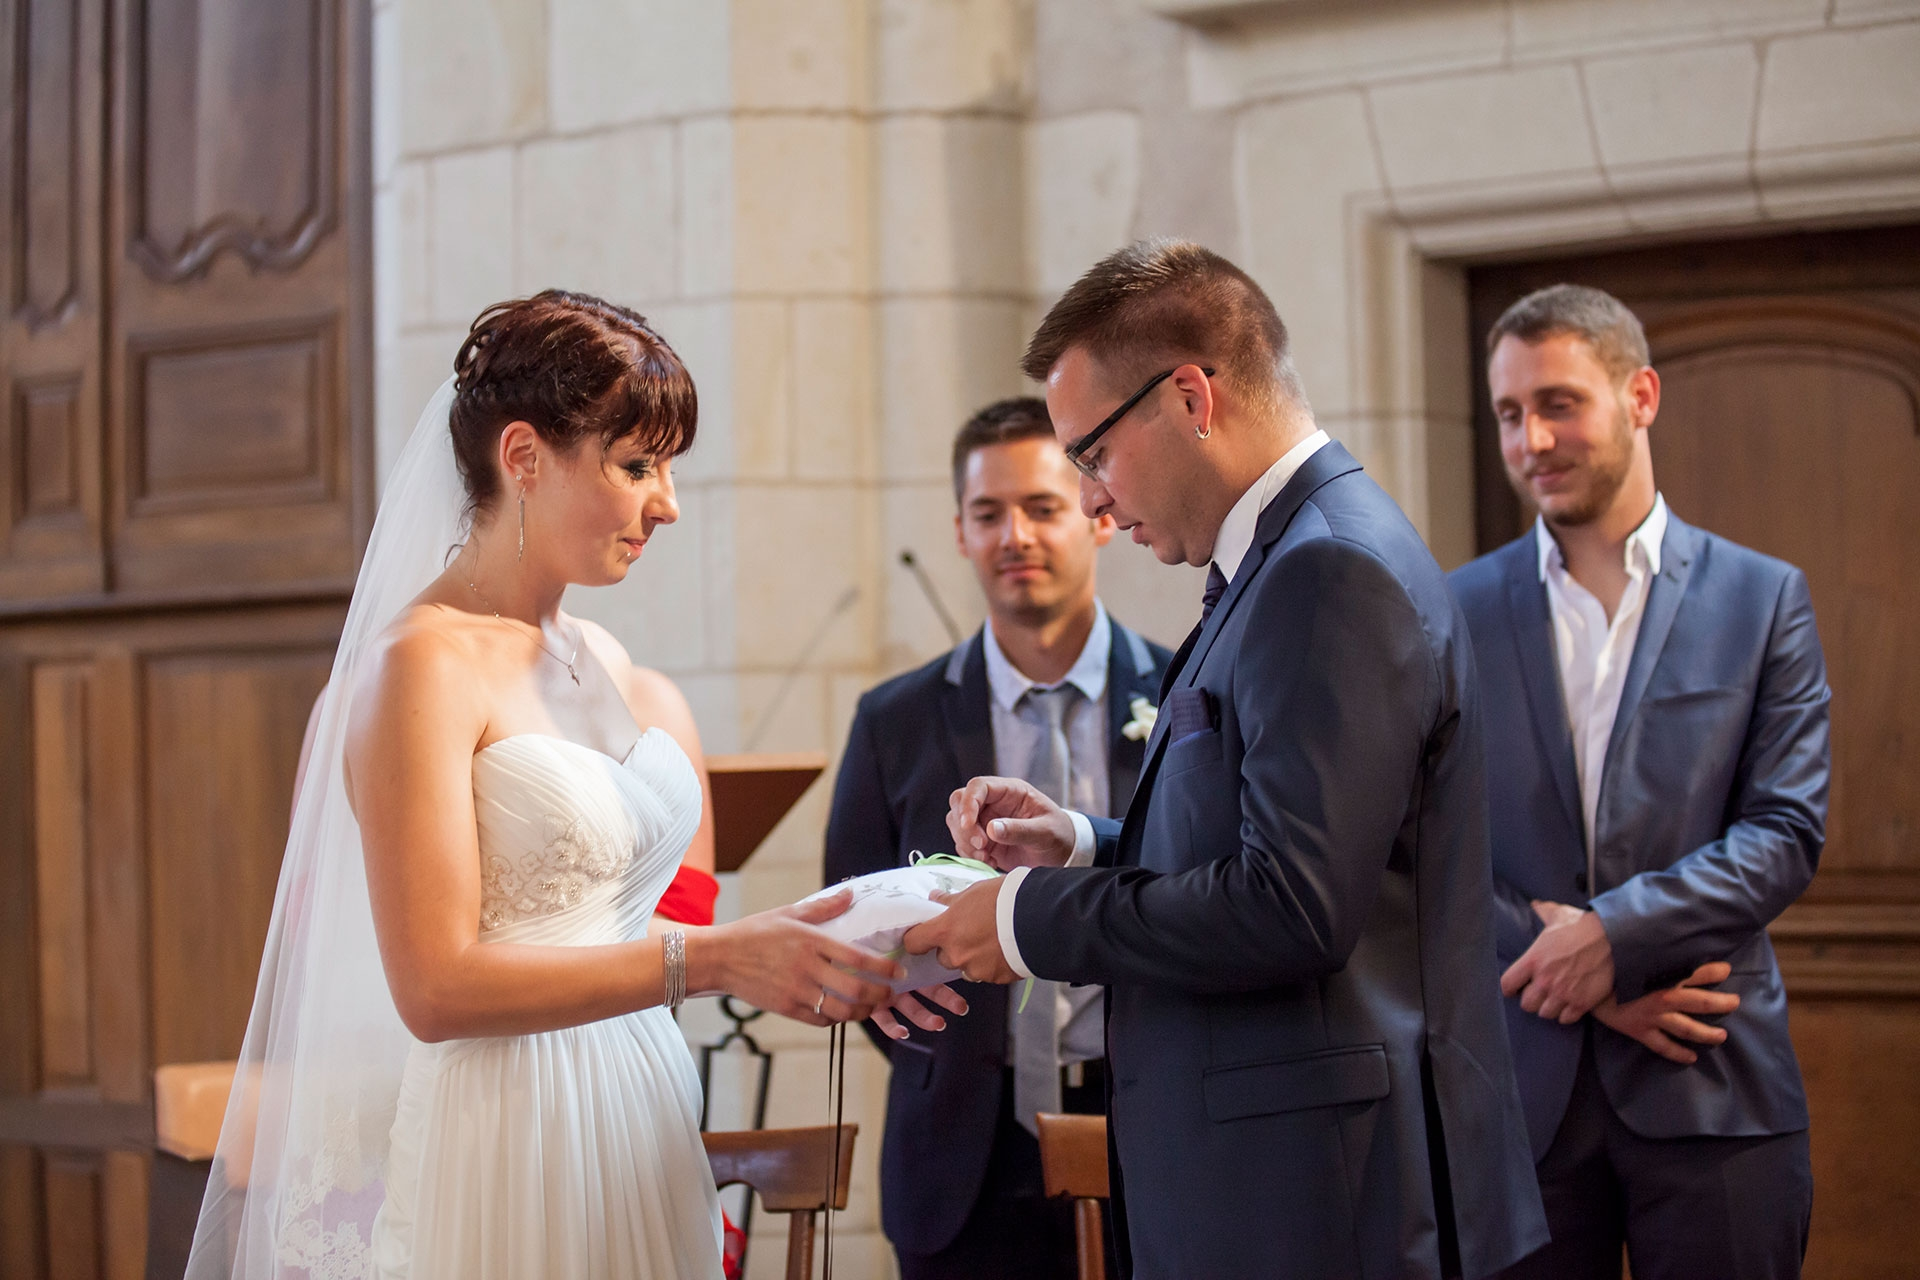 particuliers-evenements-mariages-oui-aurelie&geoffrey-19